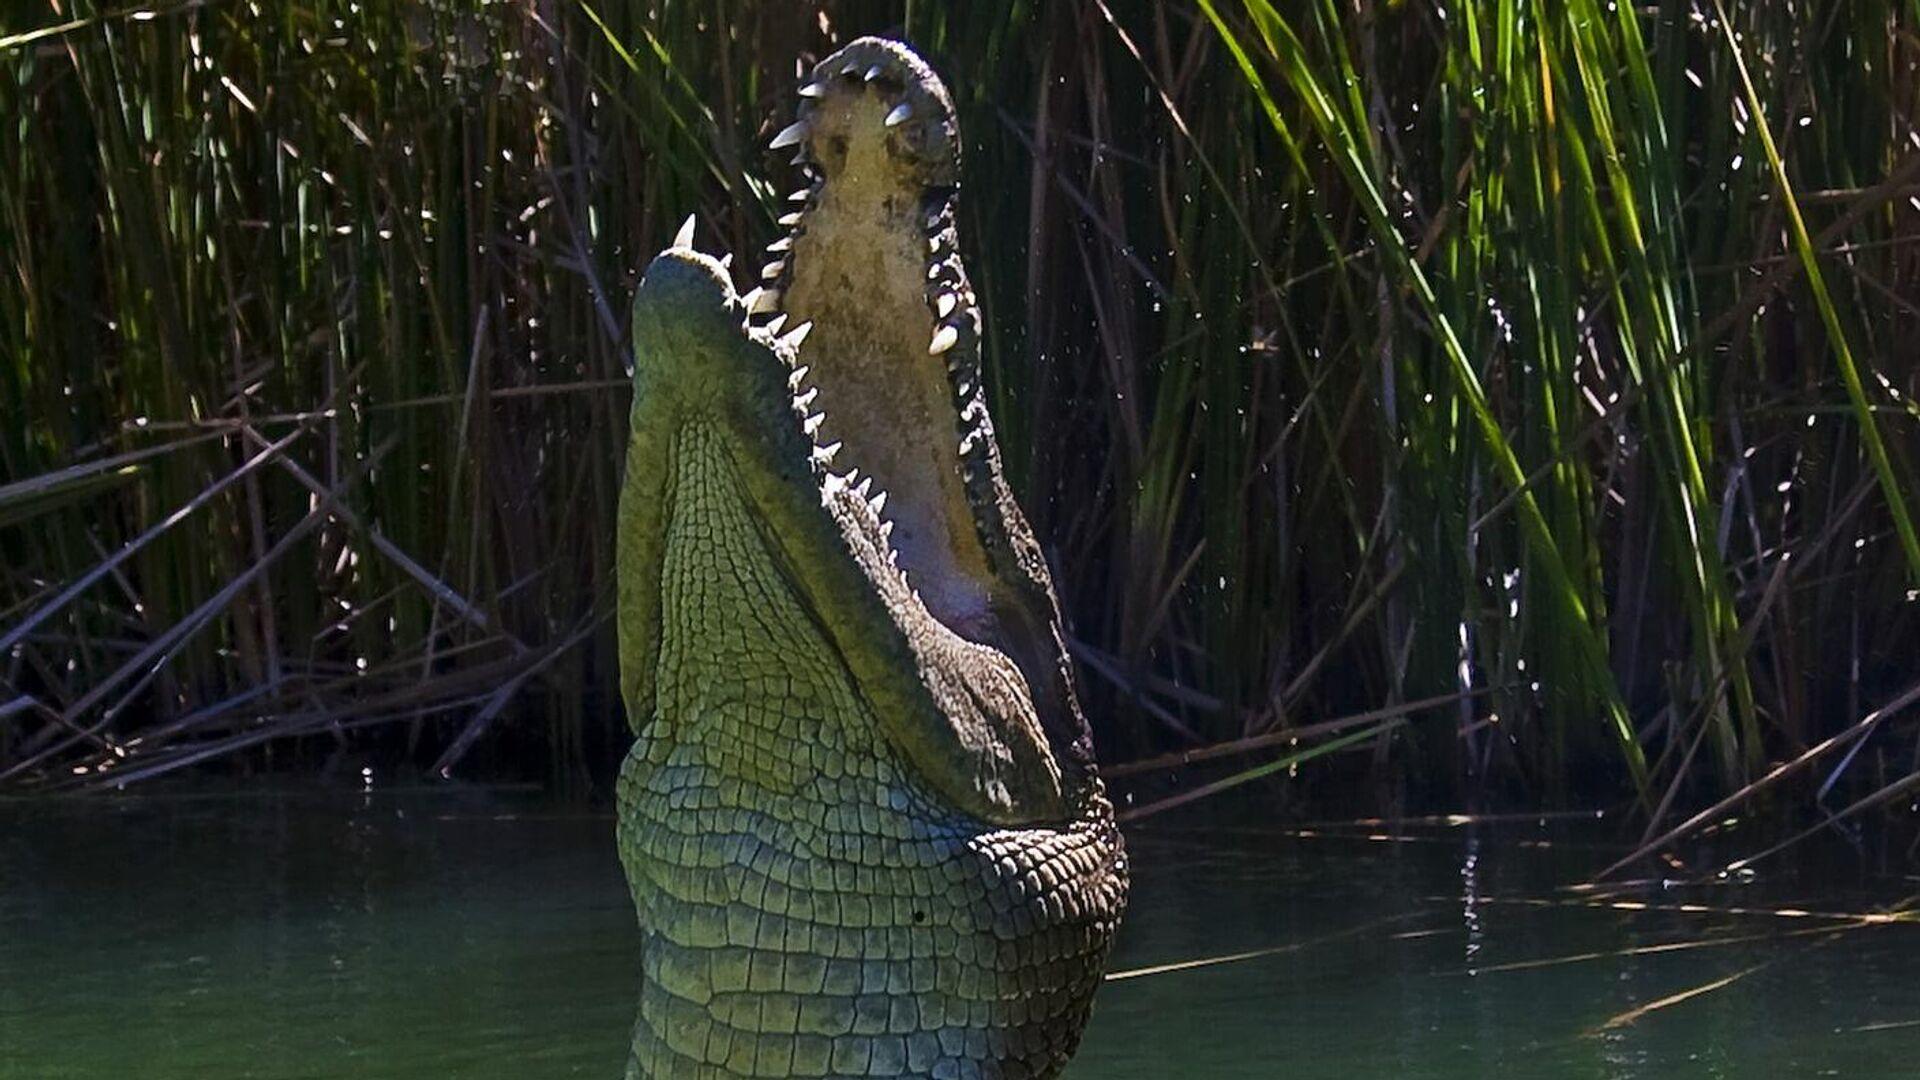 Krokodil. Symbolbild - SNA, 1920, 05.10.2021